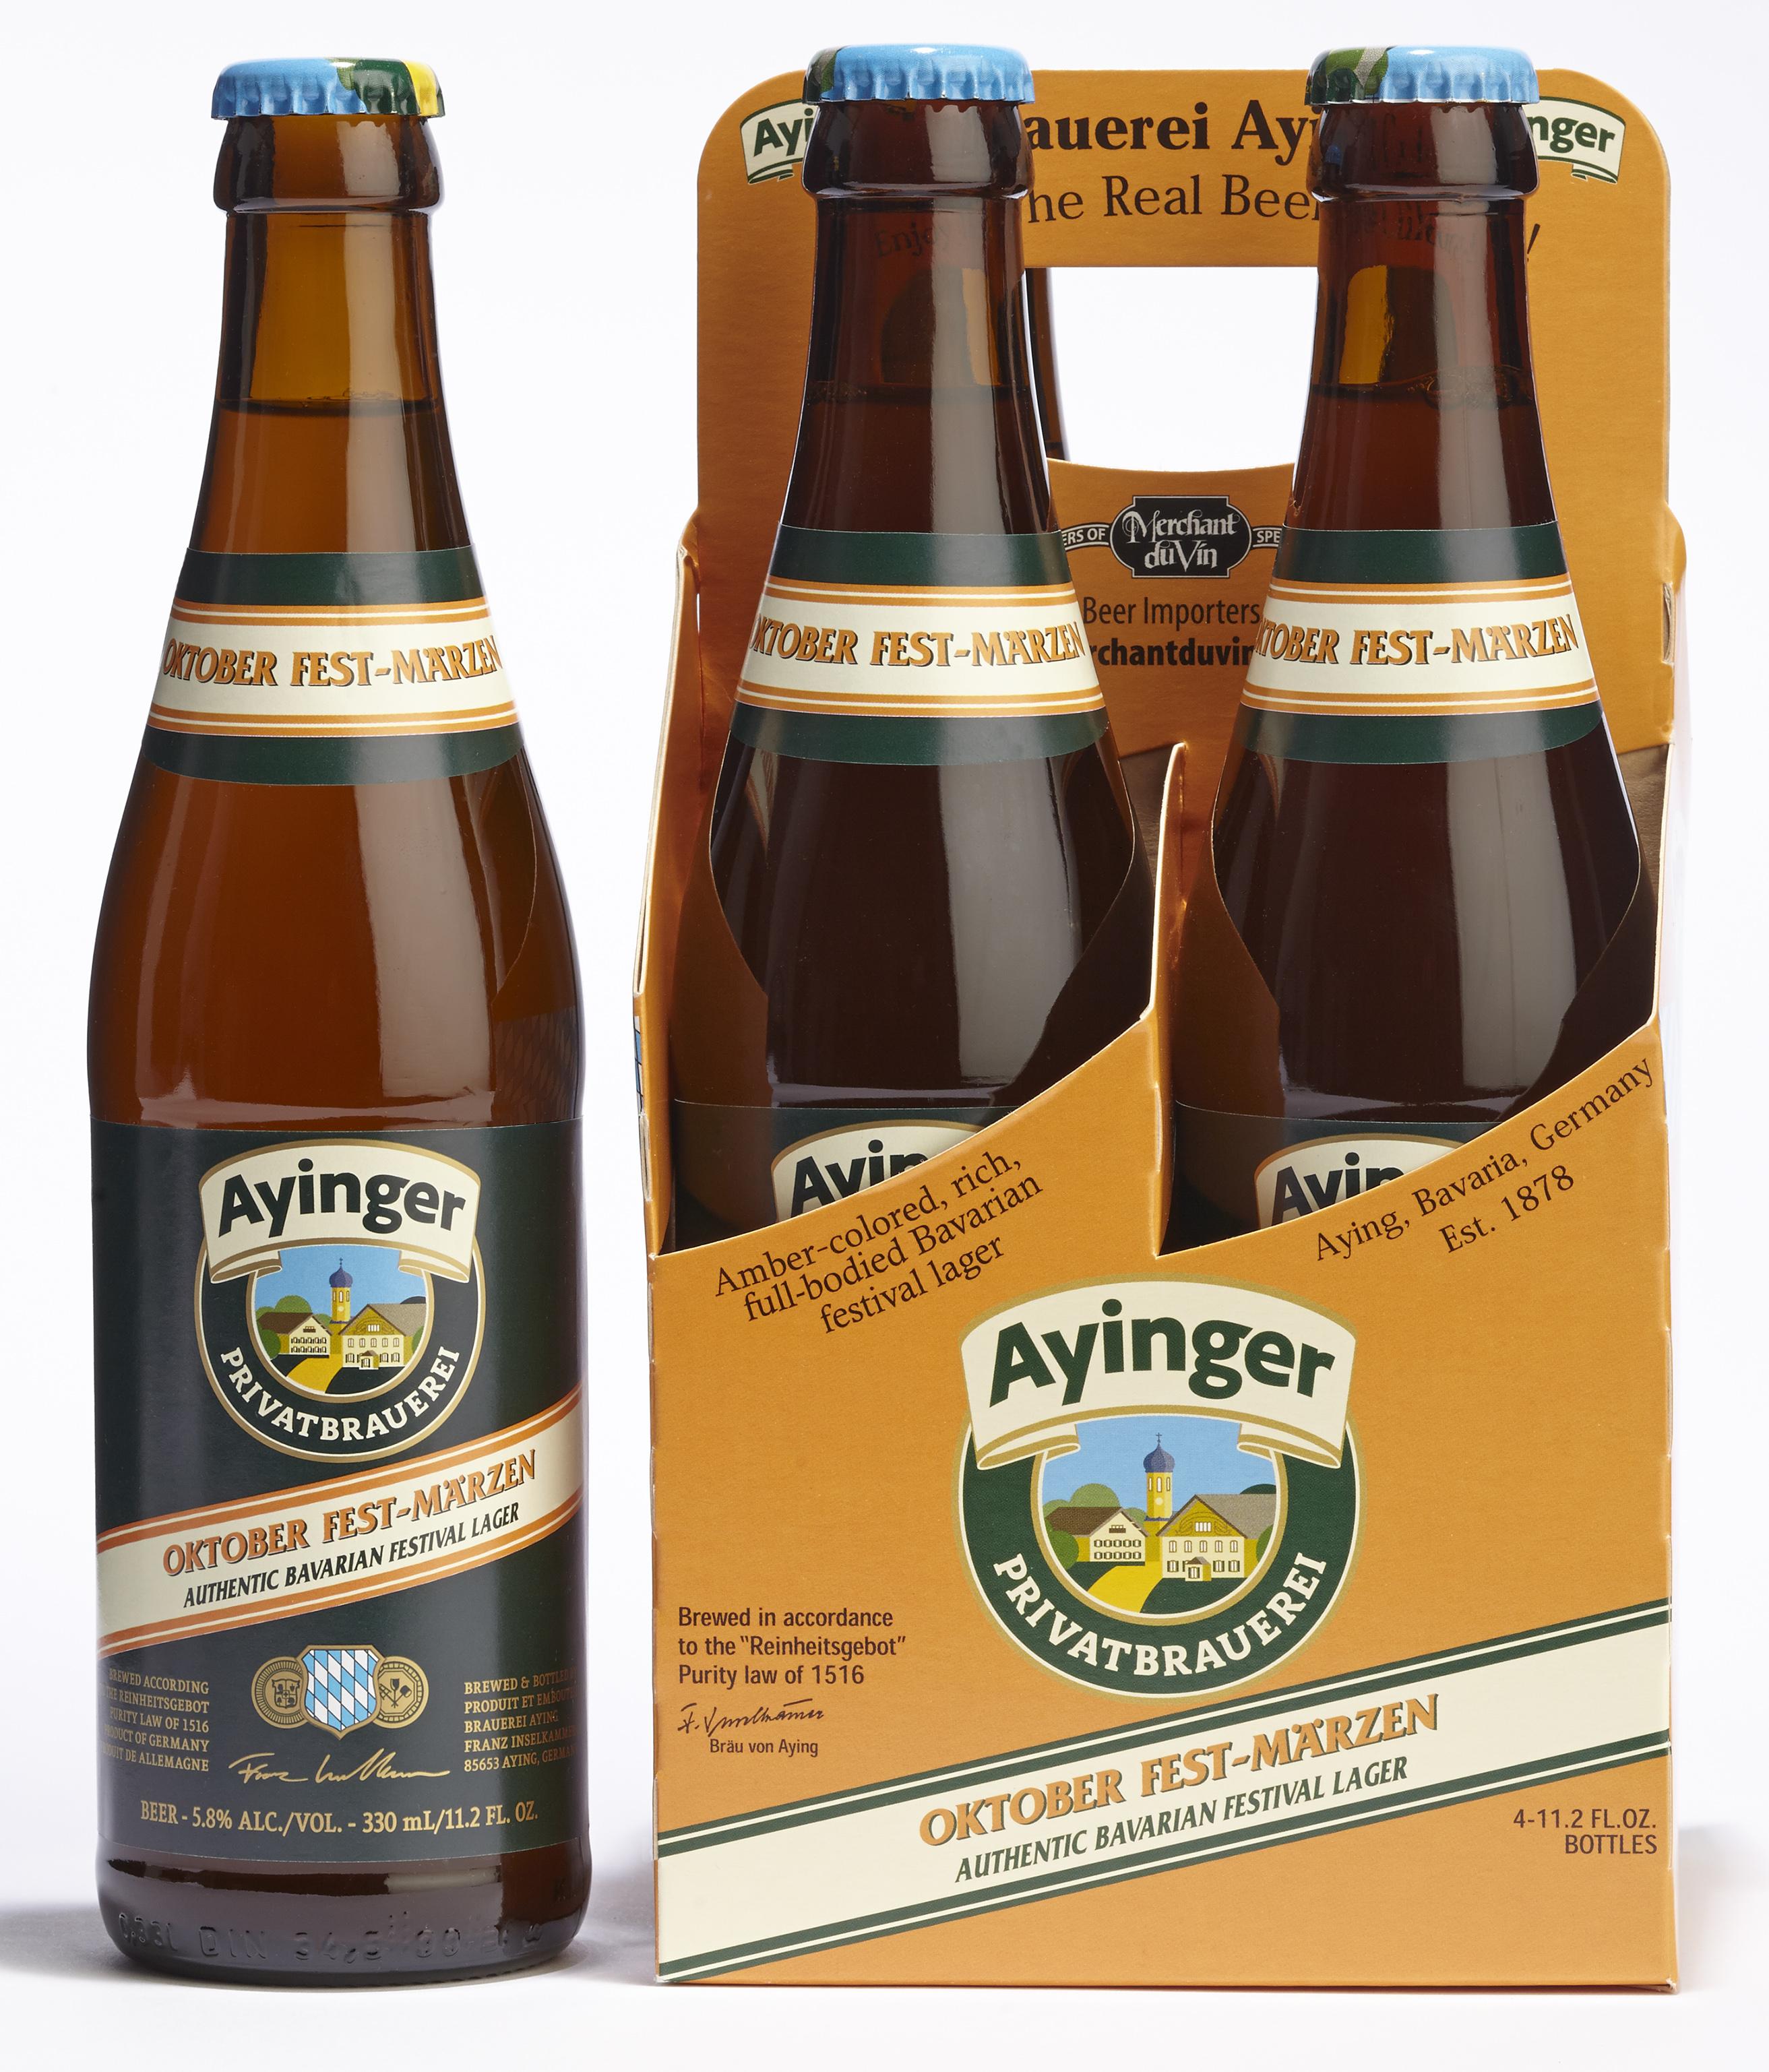 ayinger_oktober_fest_marzen_4pk_Credit-Merchant du Vin